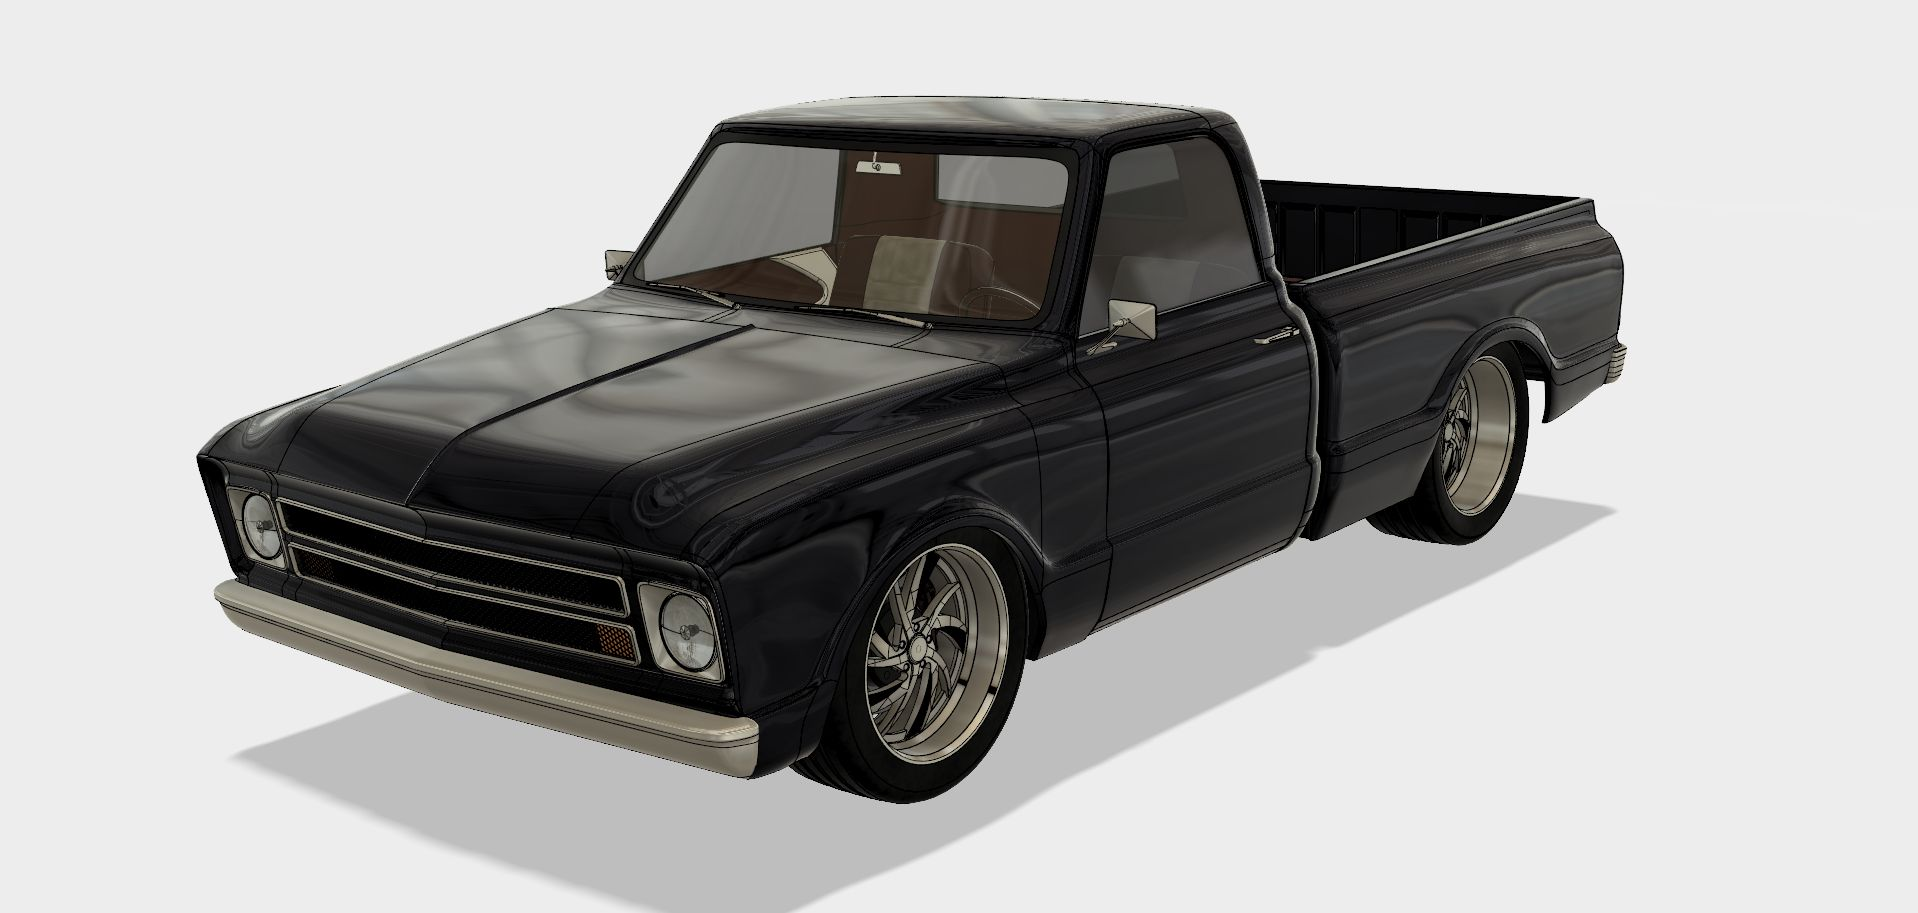 Truck-body5-v54-screen-3500-3500